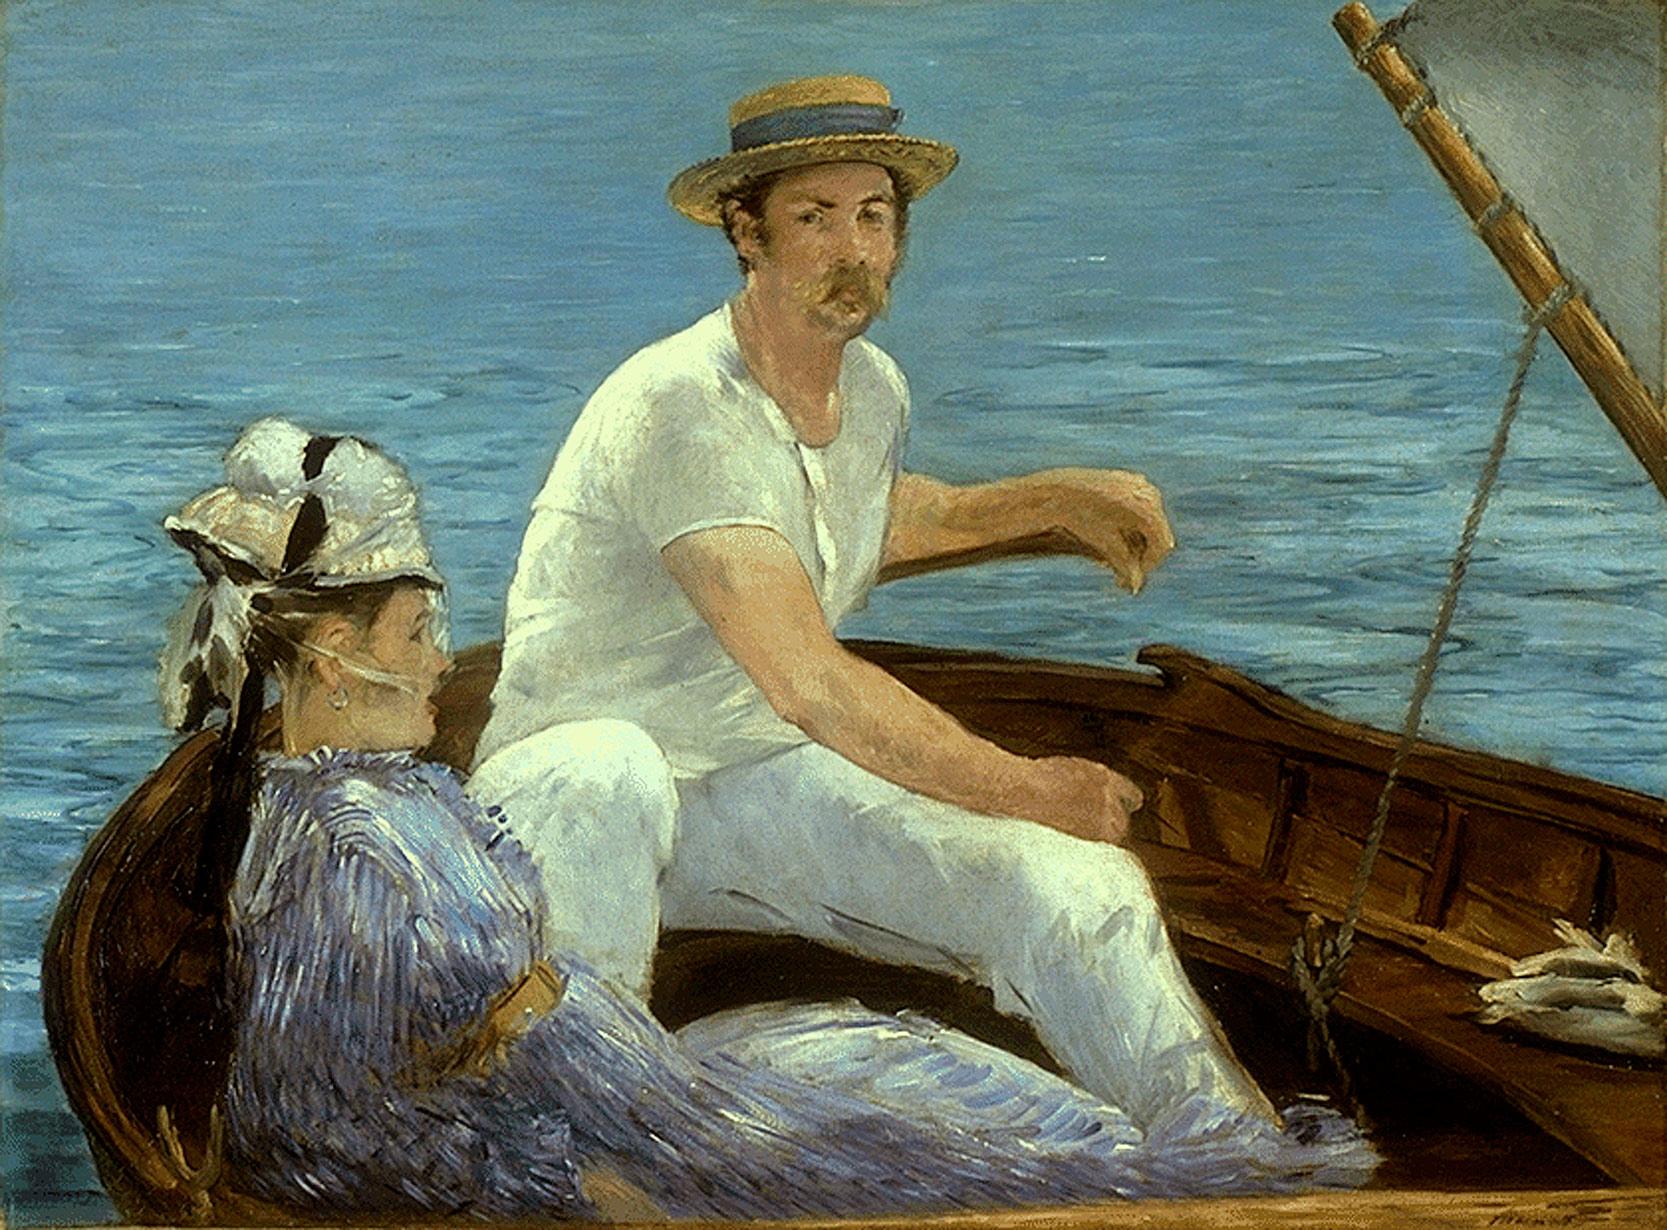 Édouard Manet Boating, 1874